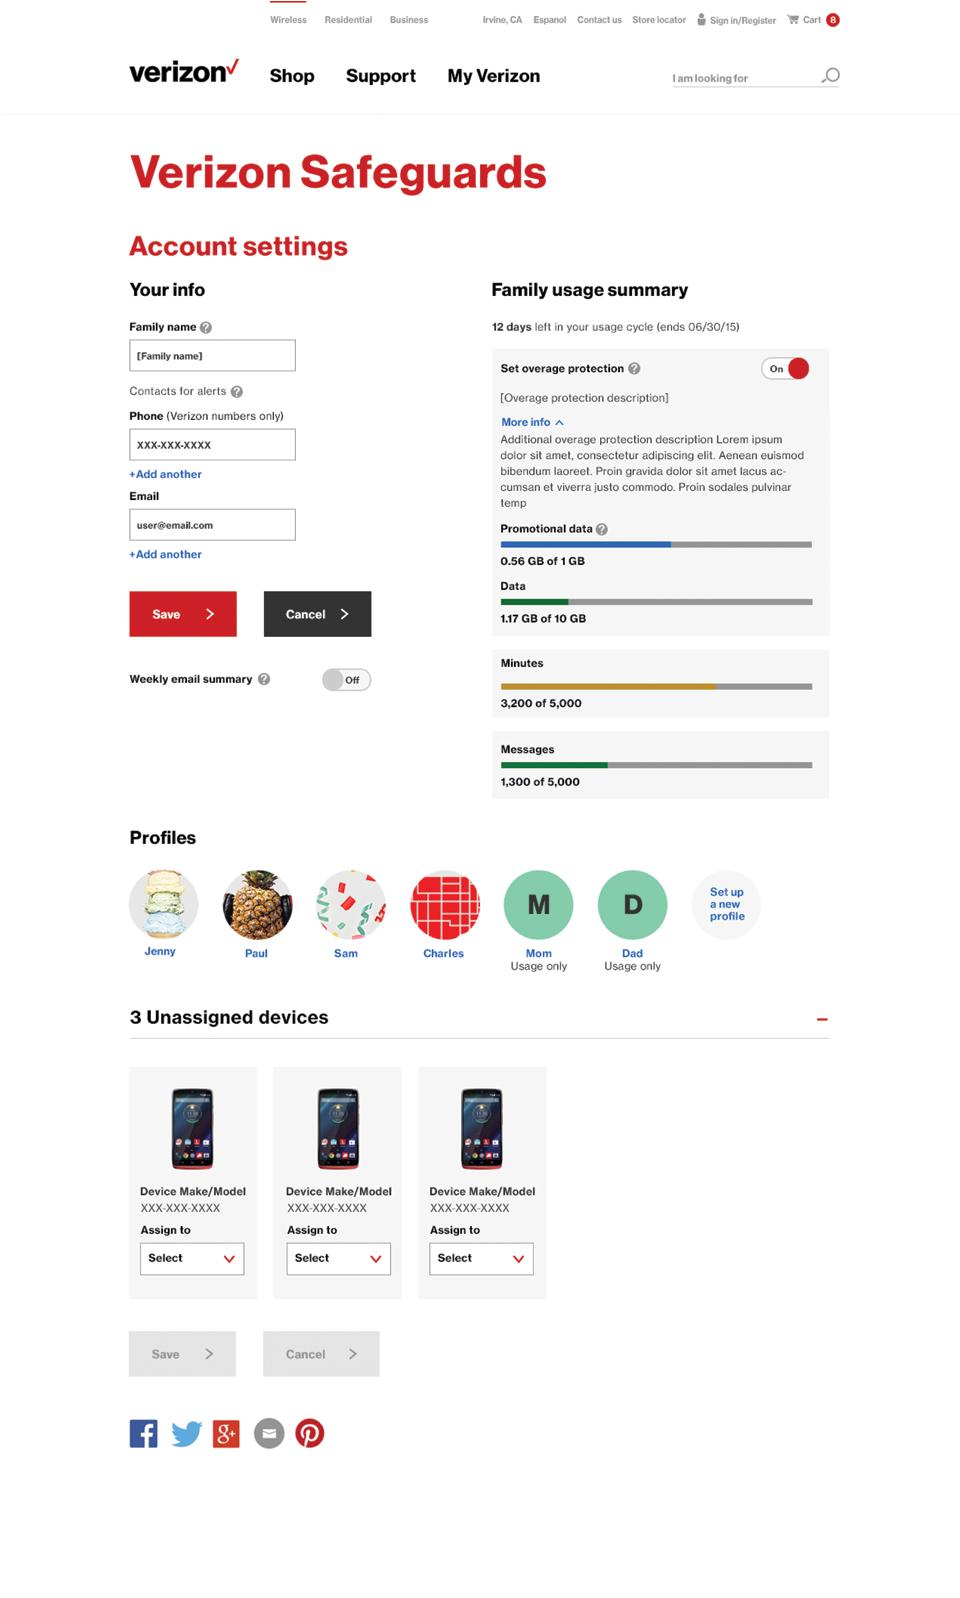 Verizon_desktop_comps_sg5.jpg